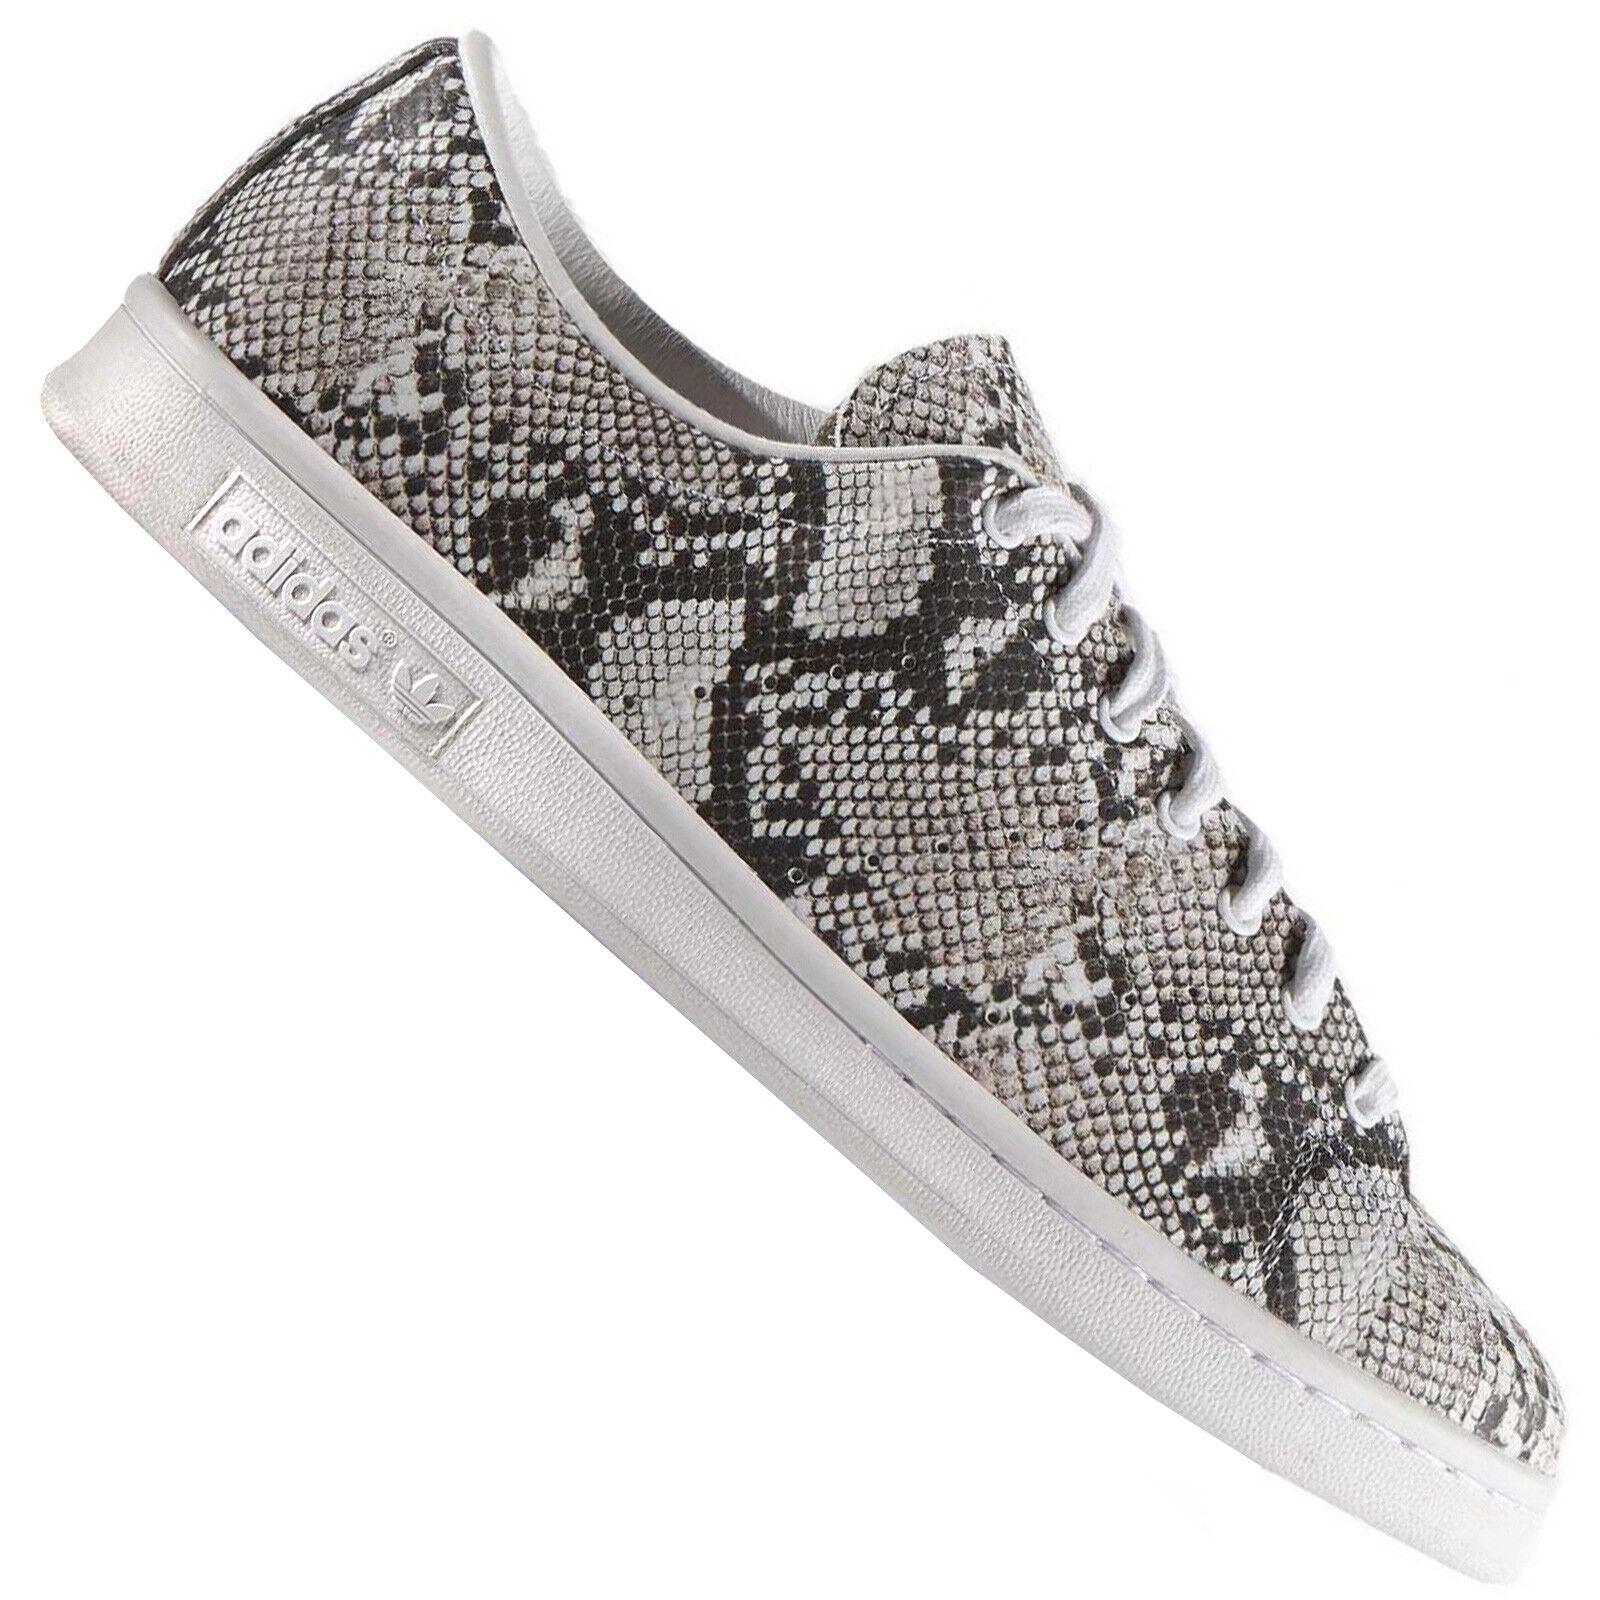 separation shoes 97cfd 0a6a1 Adidas Originals x Hyke Stan Smith Men's Sneakers AOH001 Snake Ltokio B26098